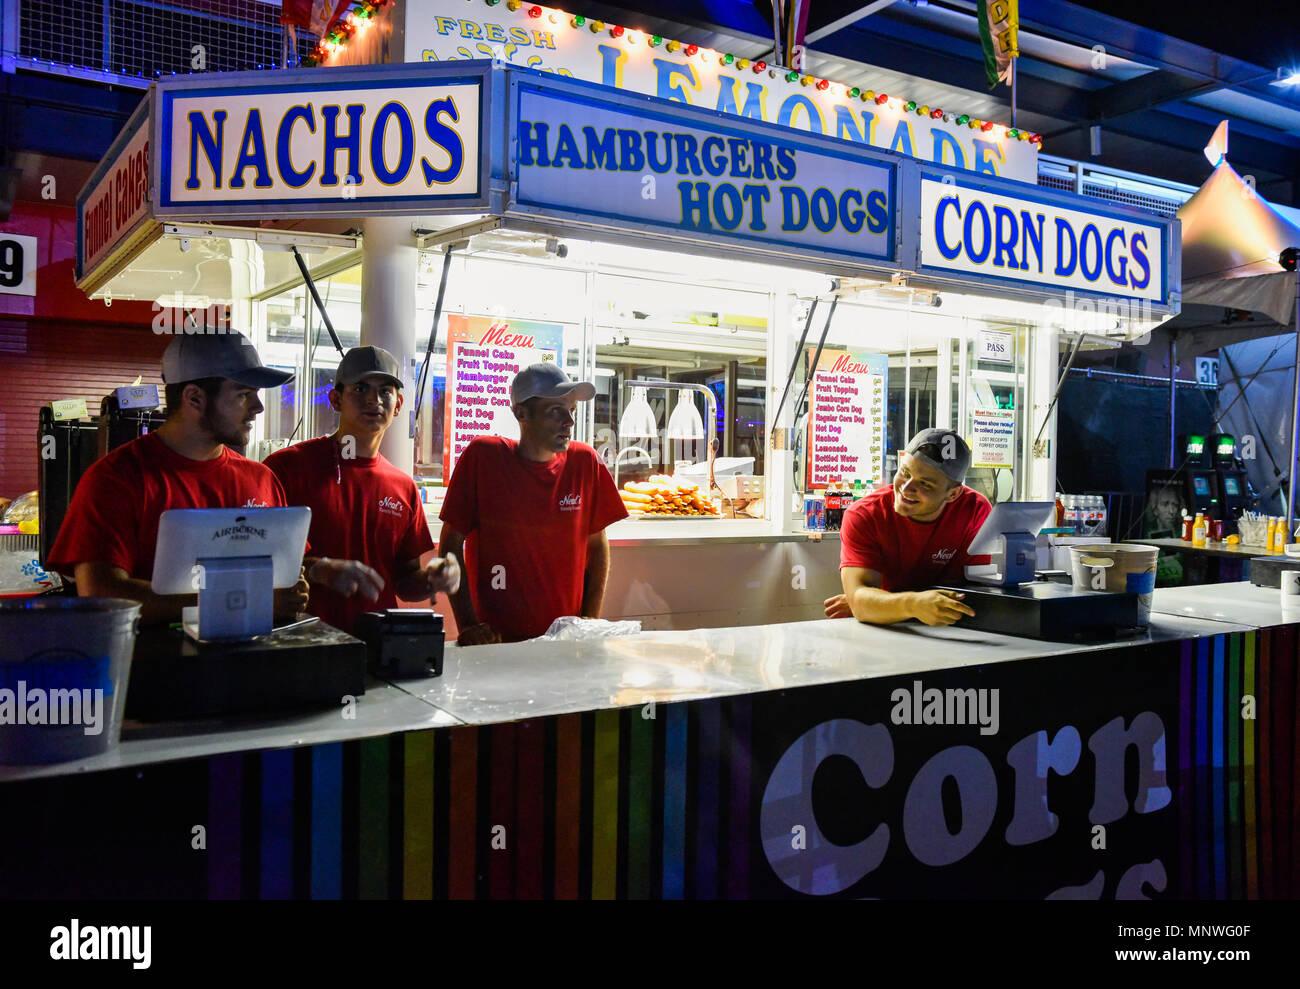 Las Vegas Nevada May 18 2018 Food Vendor At The Electric